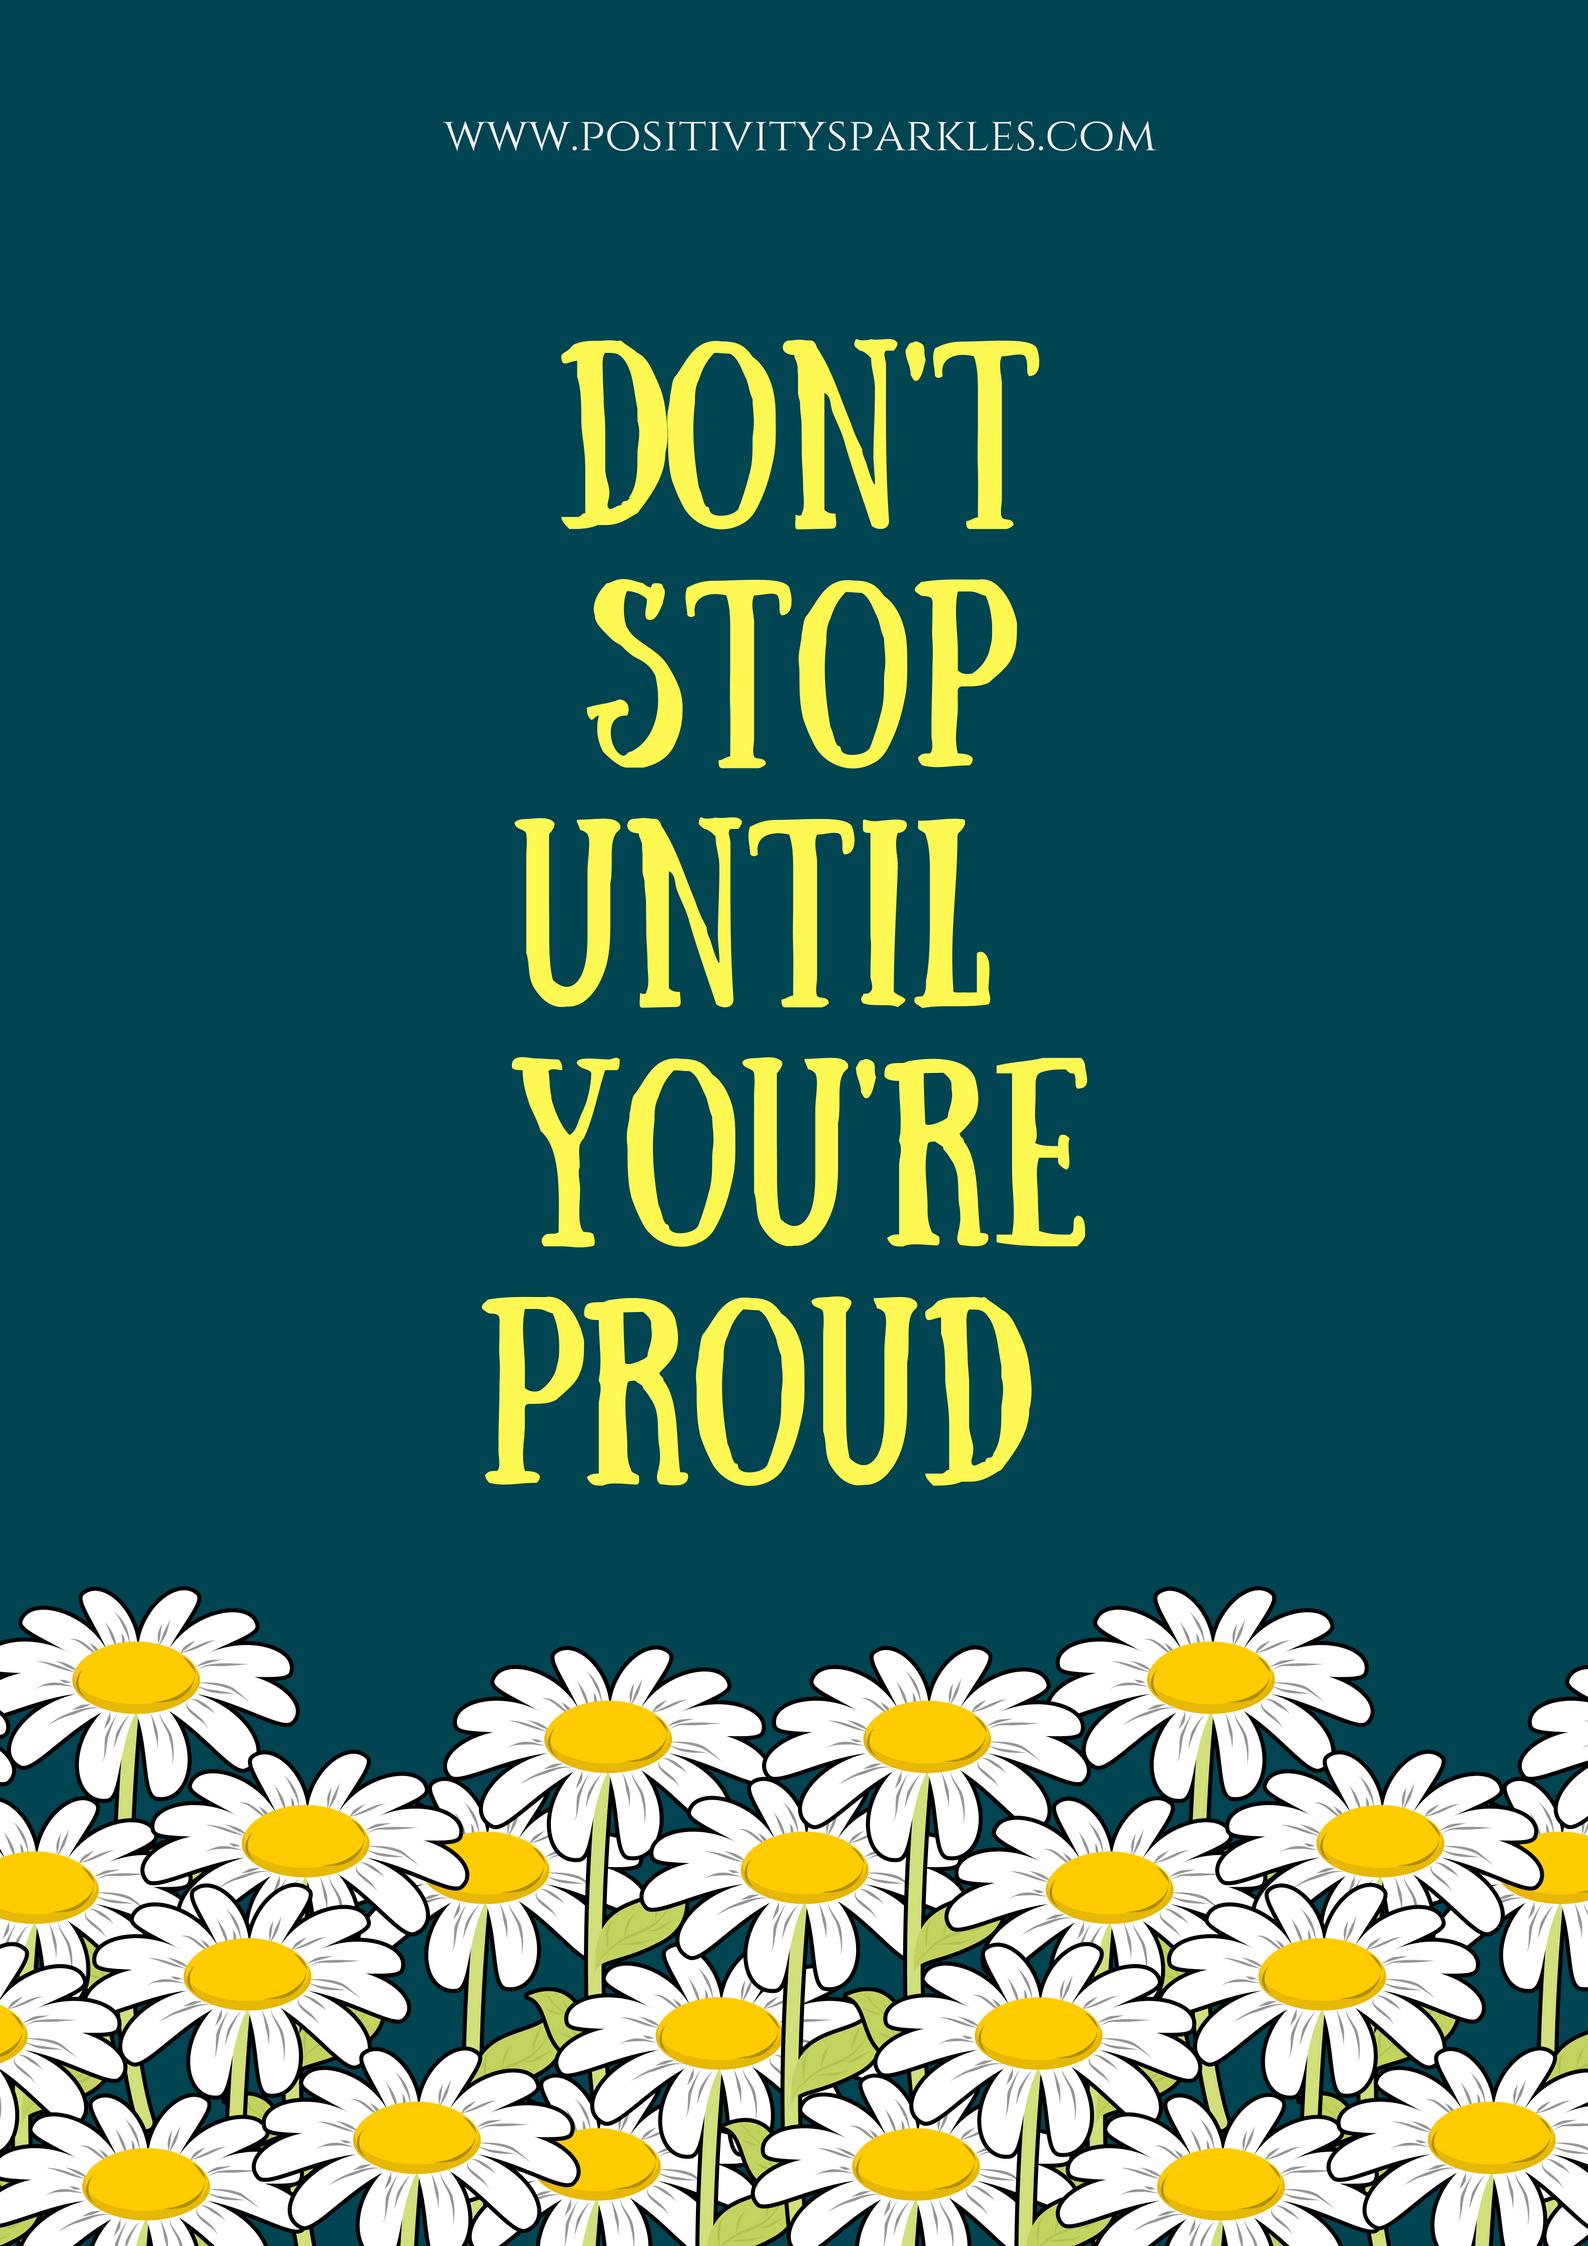 Motivational Quotes Positivity Sparkles Positive Mindset